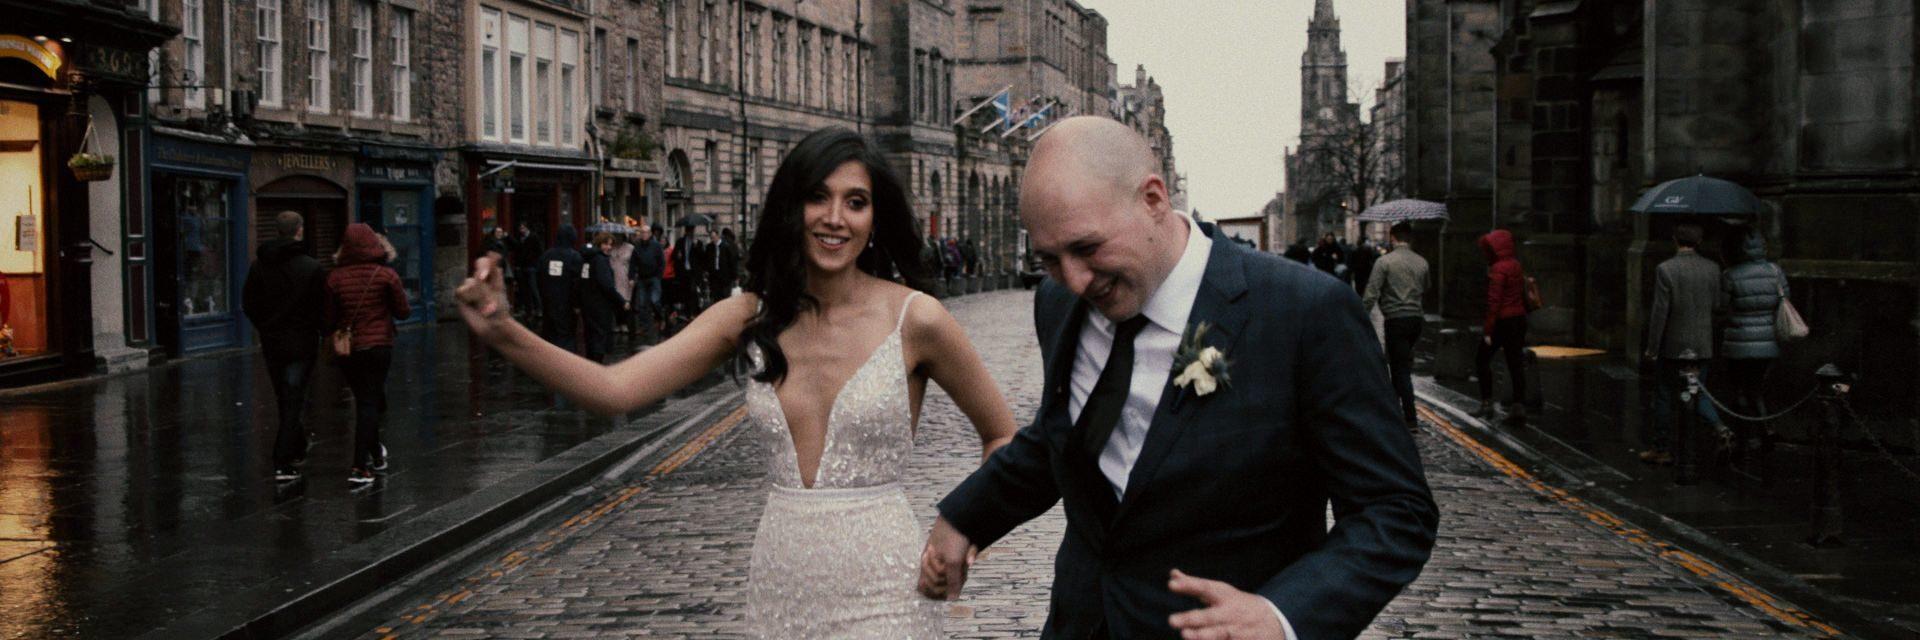 Helsinki-wedding-videographer-cinemate-films-04